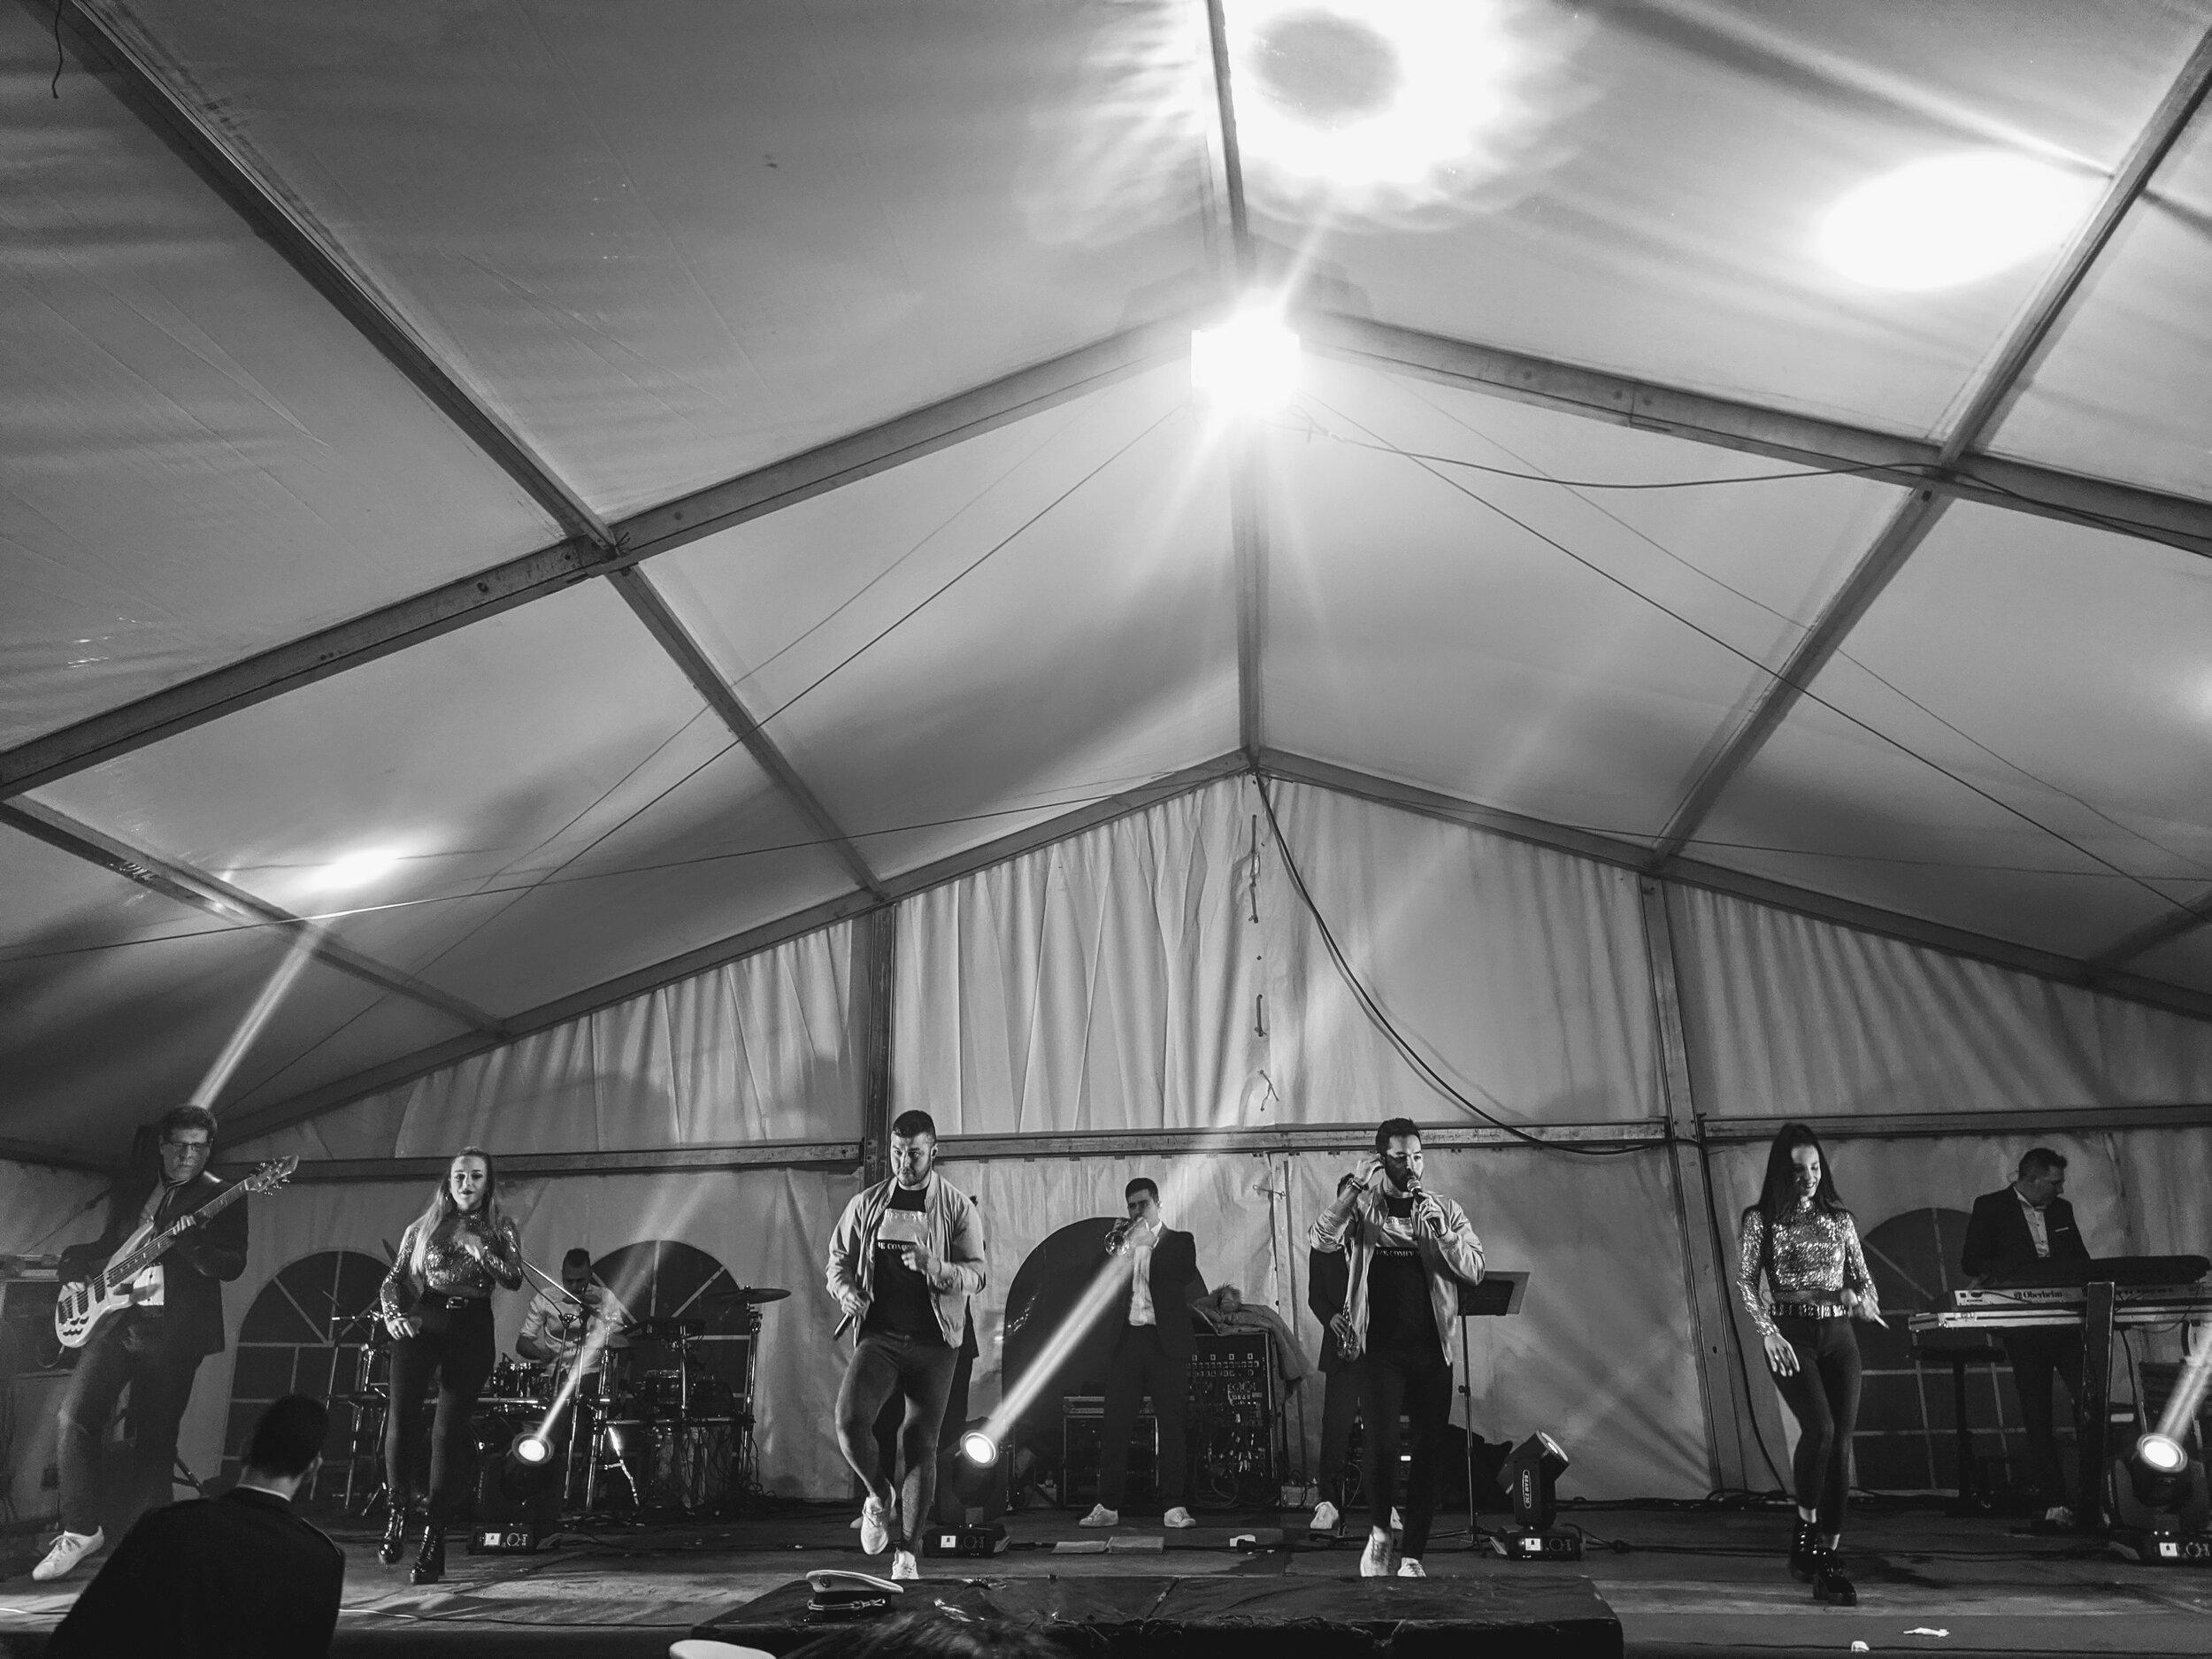 Concert in Gulans, Ponteareas